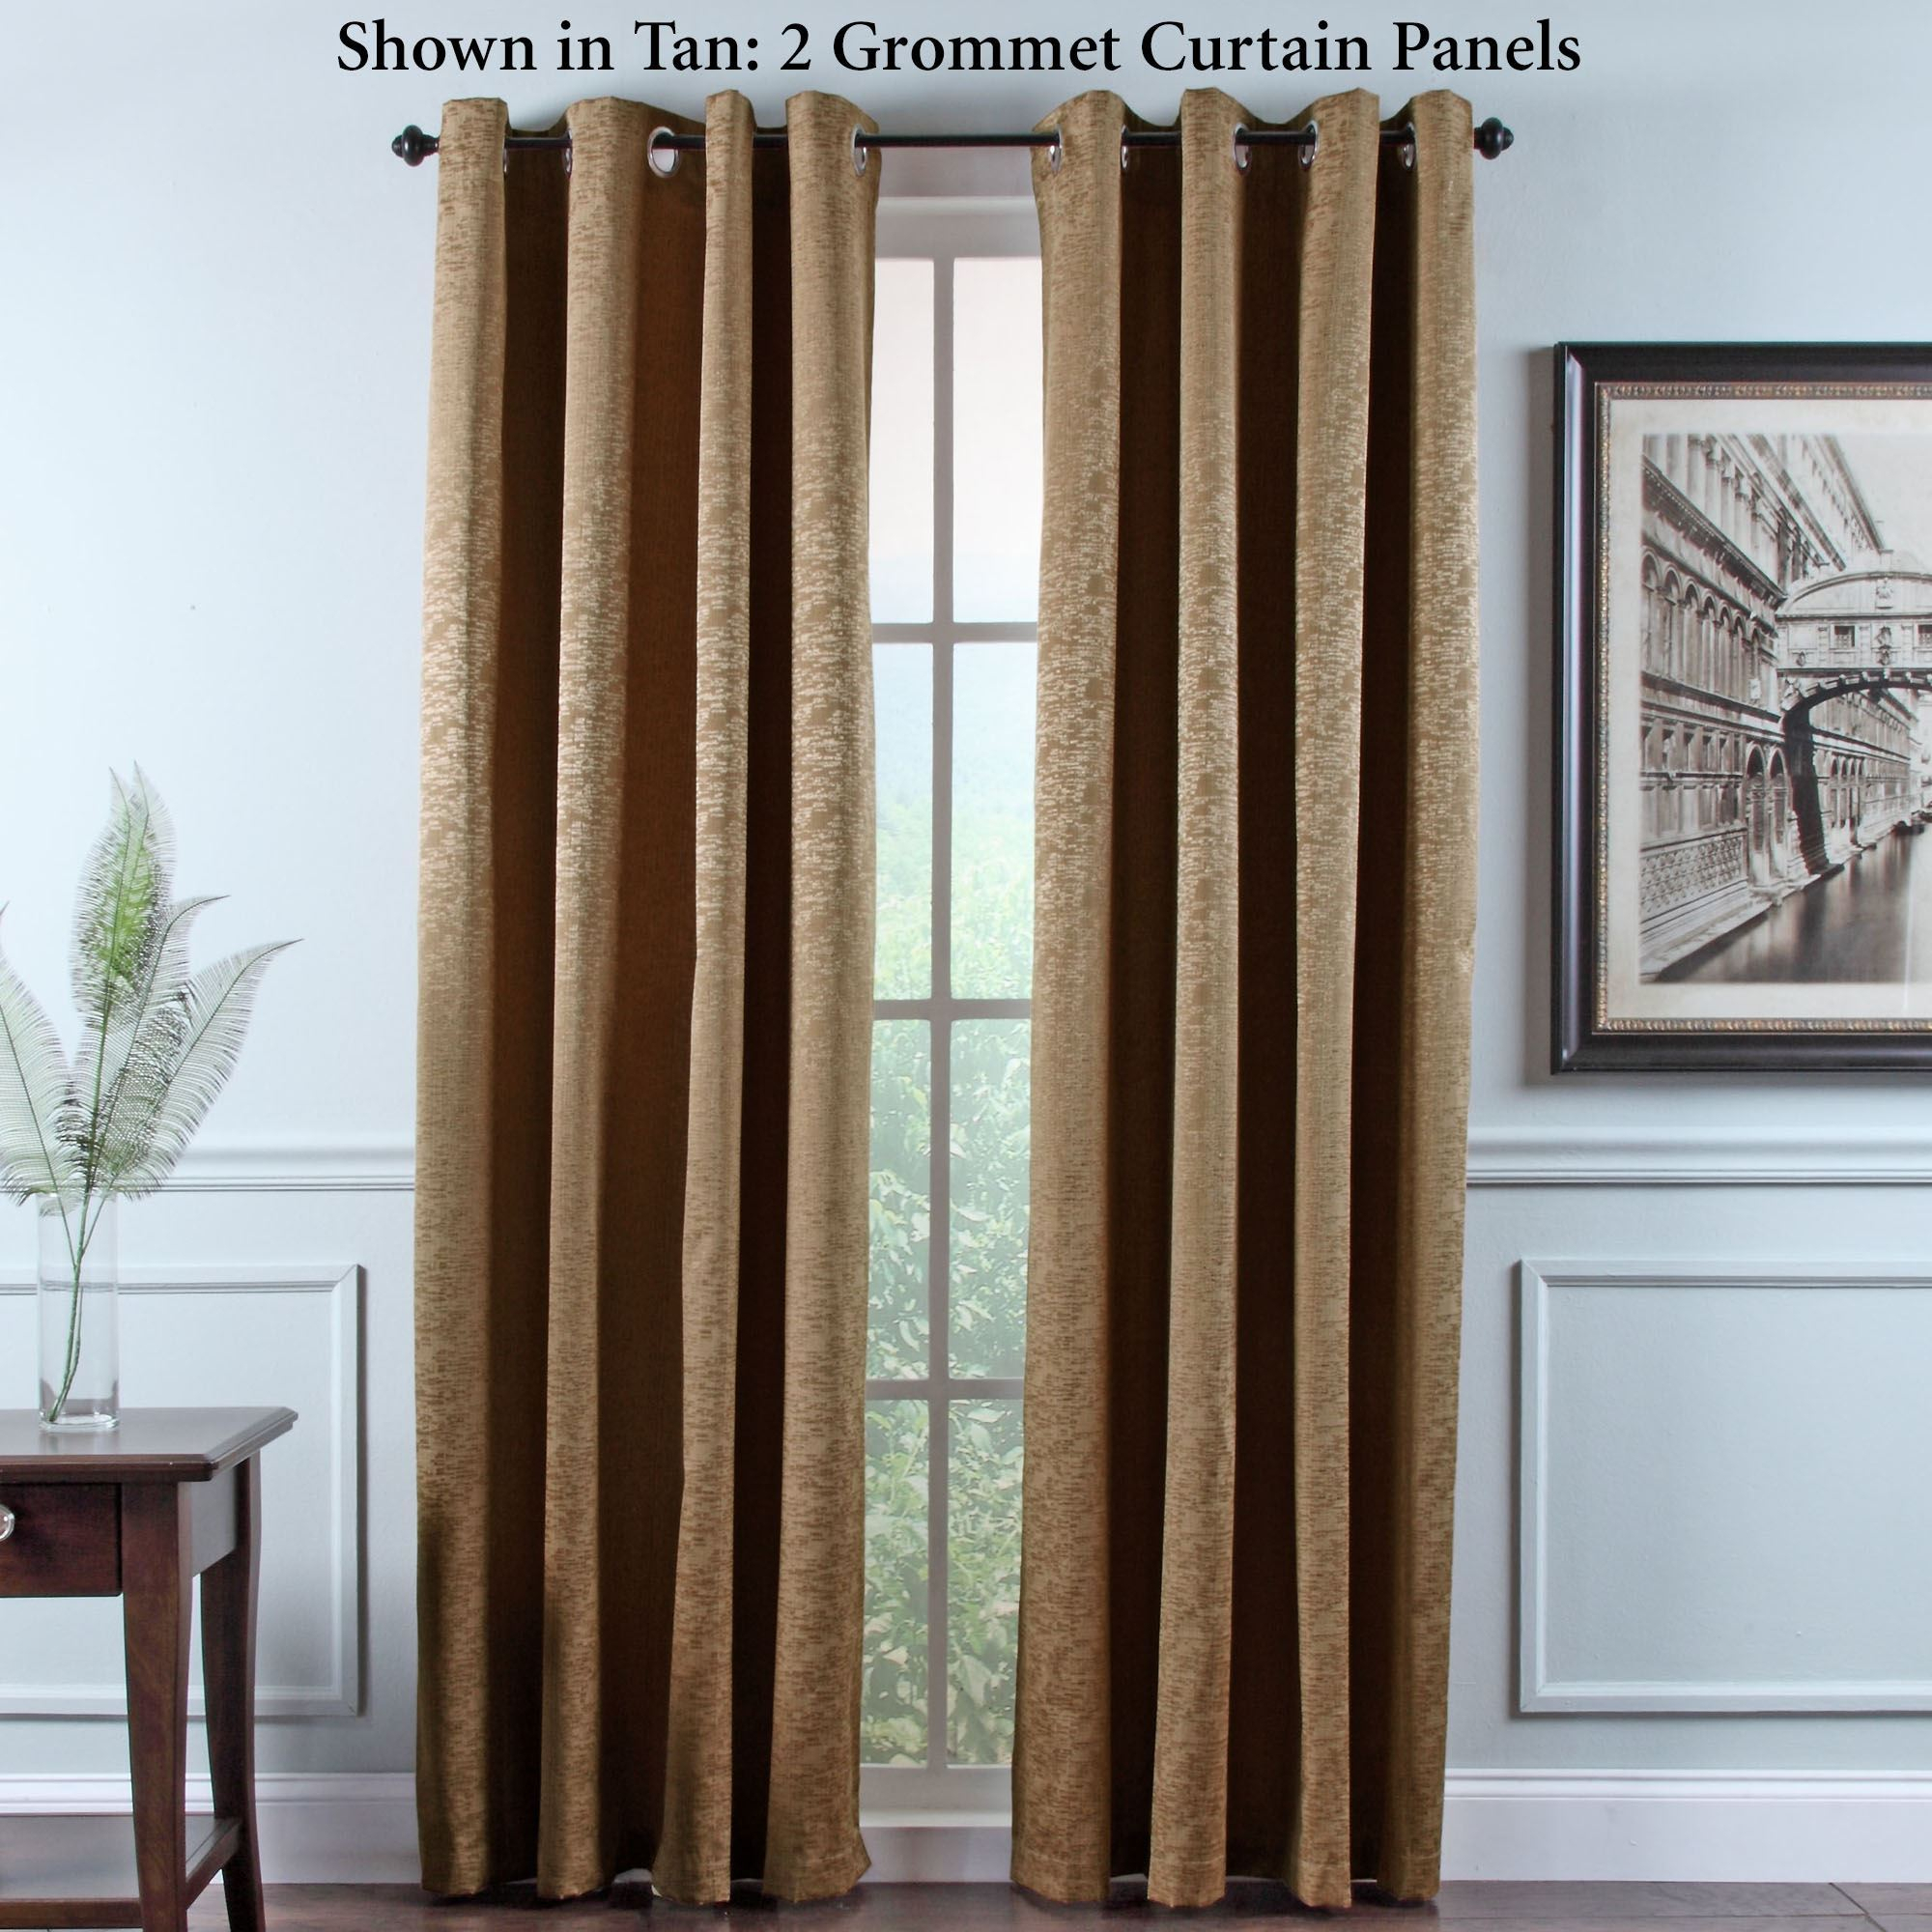 Portland Room Darkening Insulated Grommet Curtain Panels within Grommet Room Darkening Curtain Panels (Image 13 of 20)